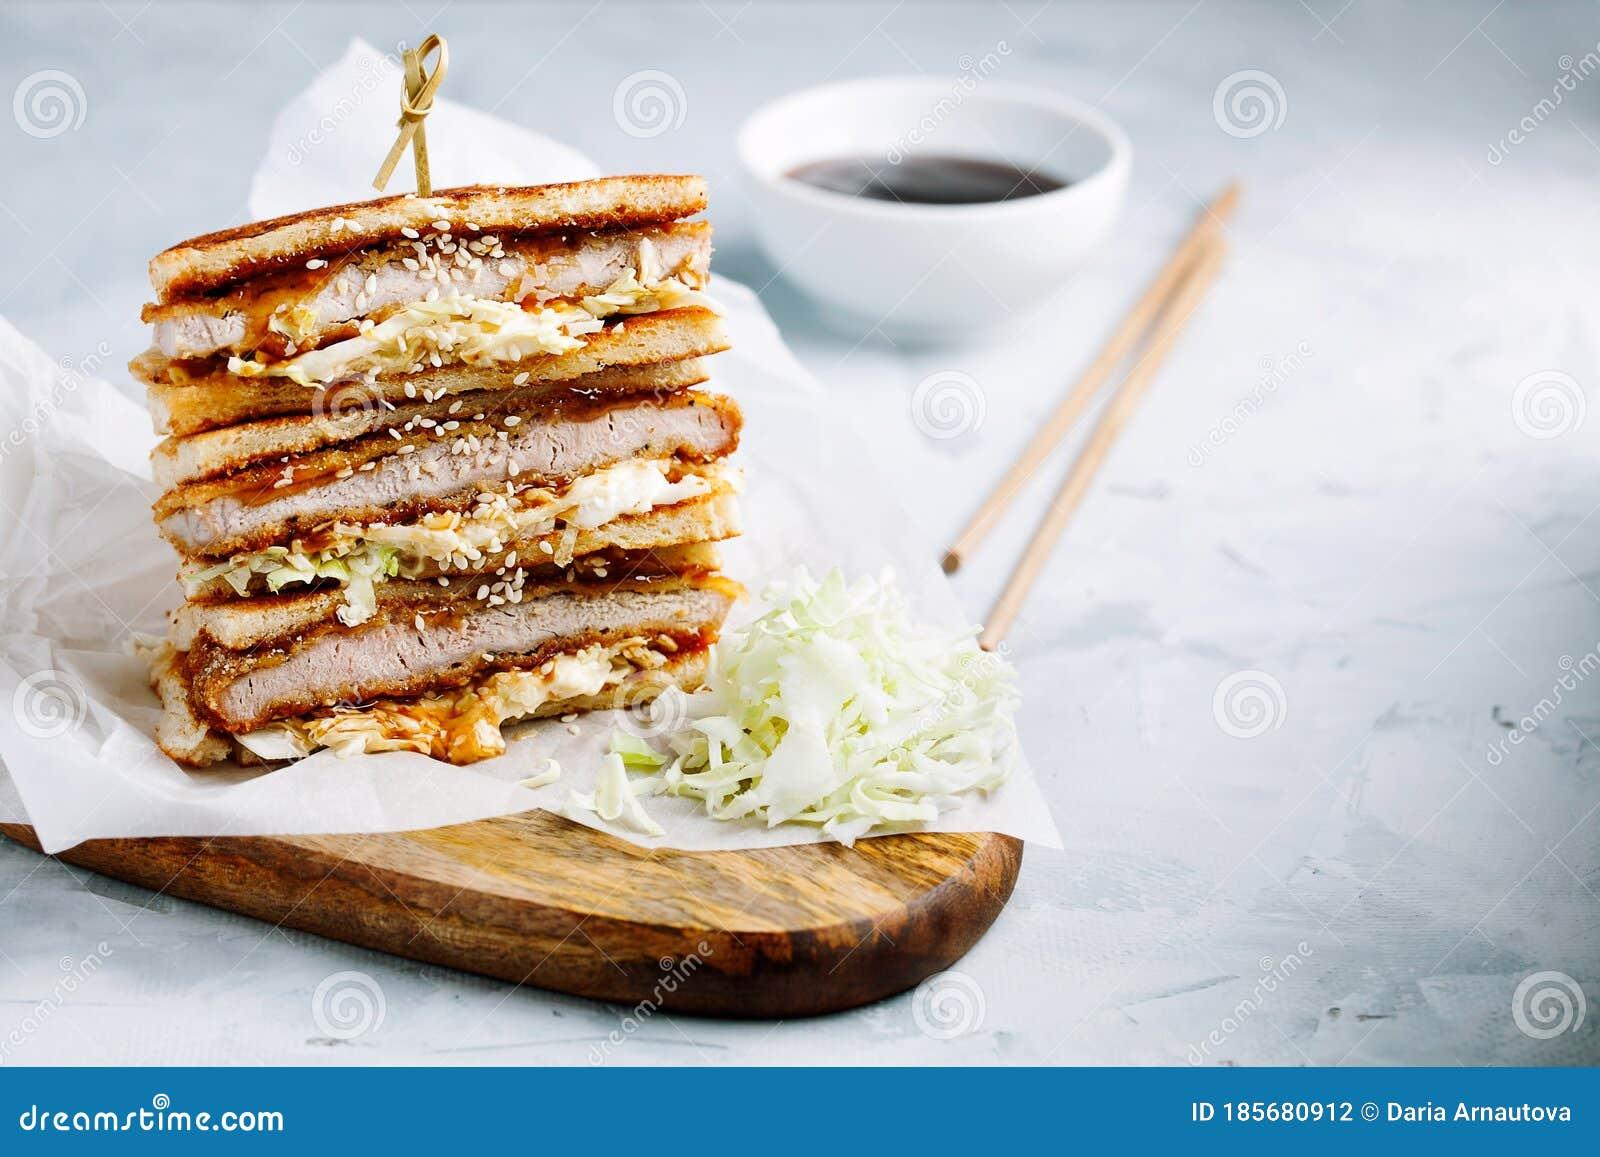 Katsu Sando Japanese Cutlet Sandwich With Deep Fried  Pork,cabbage,mayonnaise And Tonkatsu Sauce On A Light Background Stock  Photo - Image of cuisine, katsu: 185680912